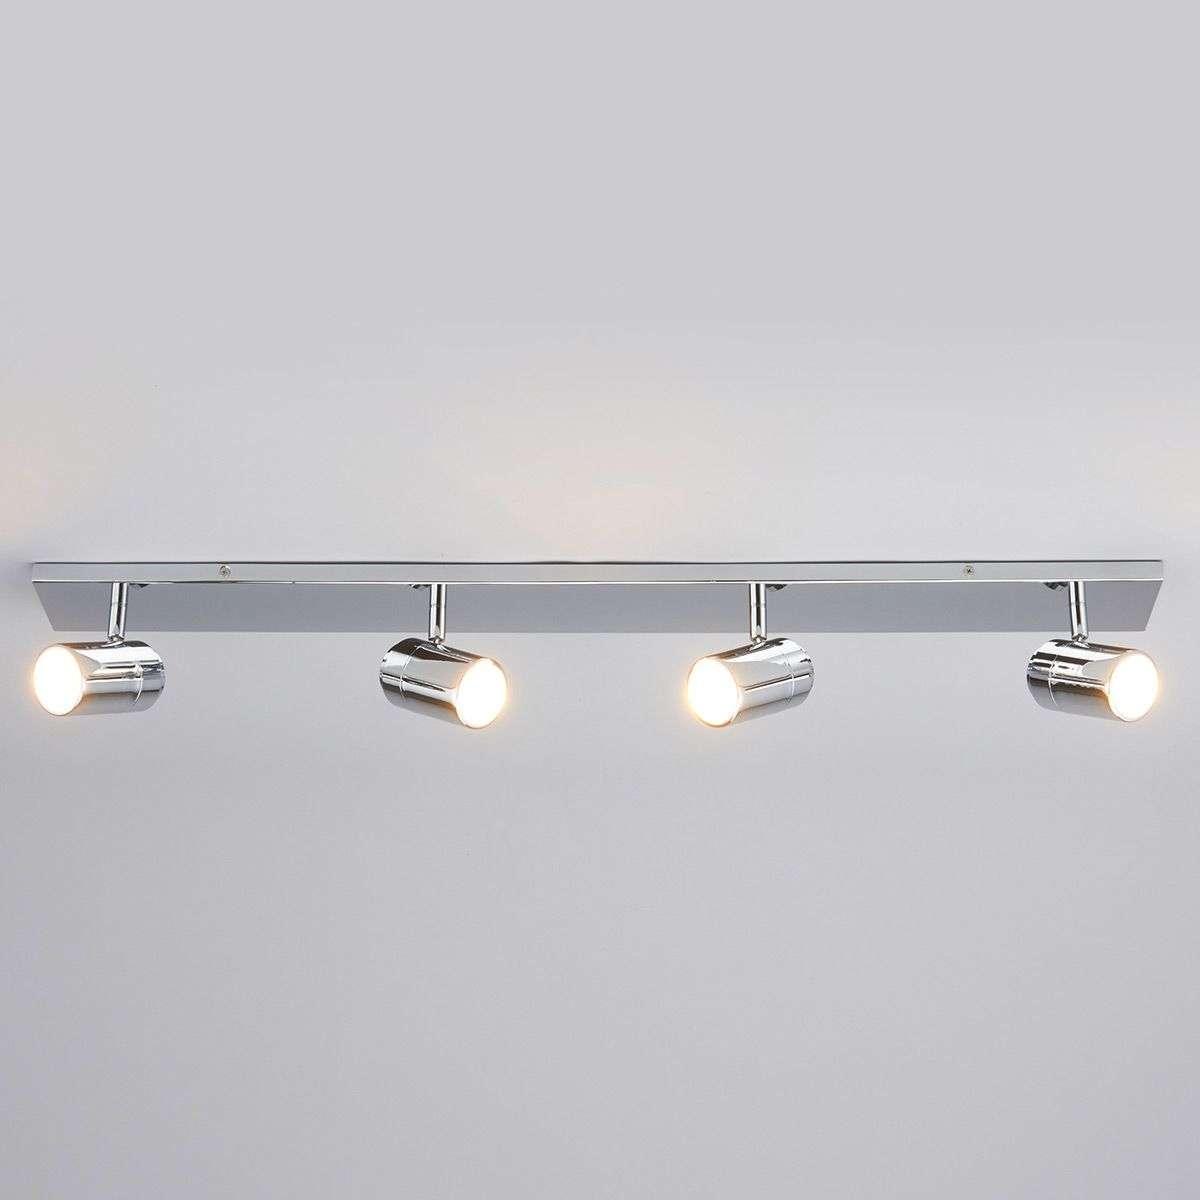 Dejan 4 bulb bathroom ceiling light lights dejan 4 bulb bathroom ceiling light 9641040 31 audiocablefo